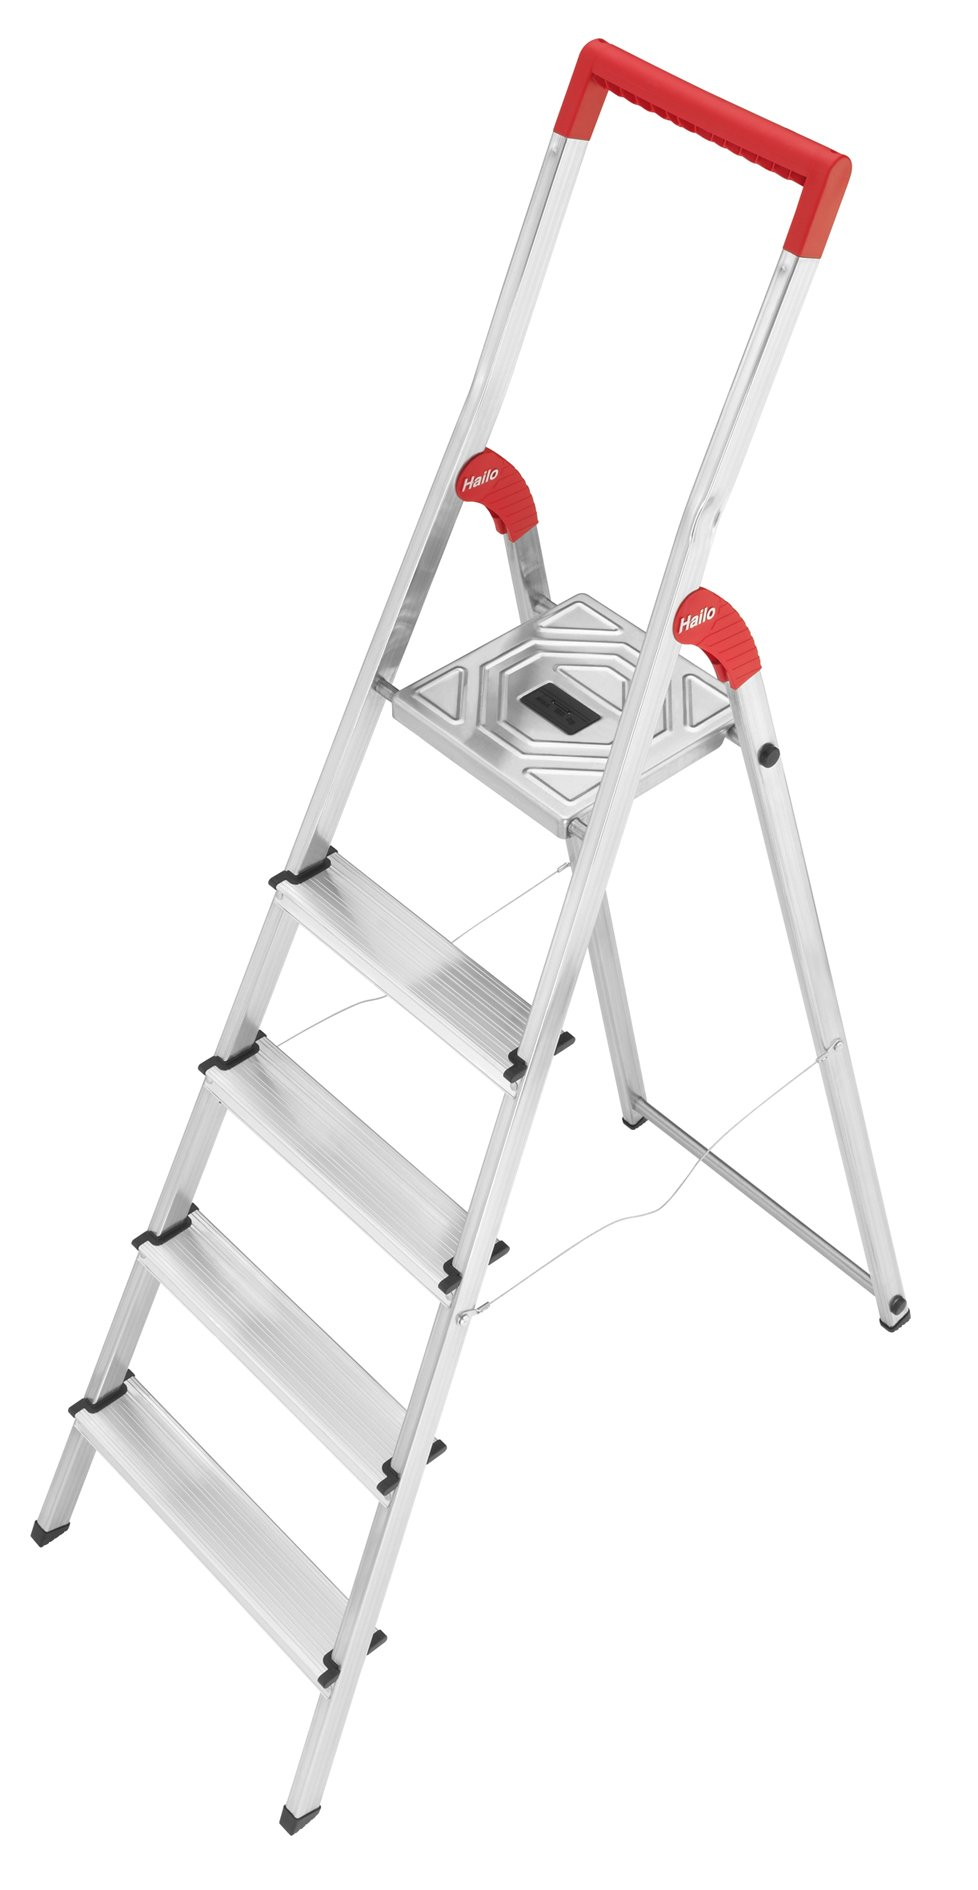 Hailo 8935-001 L50-Model 225-Pound Capacity ANSI Certified Aluminum Ladder, 6-Foot